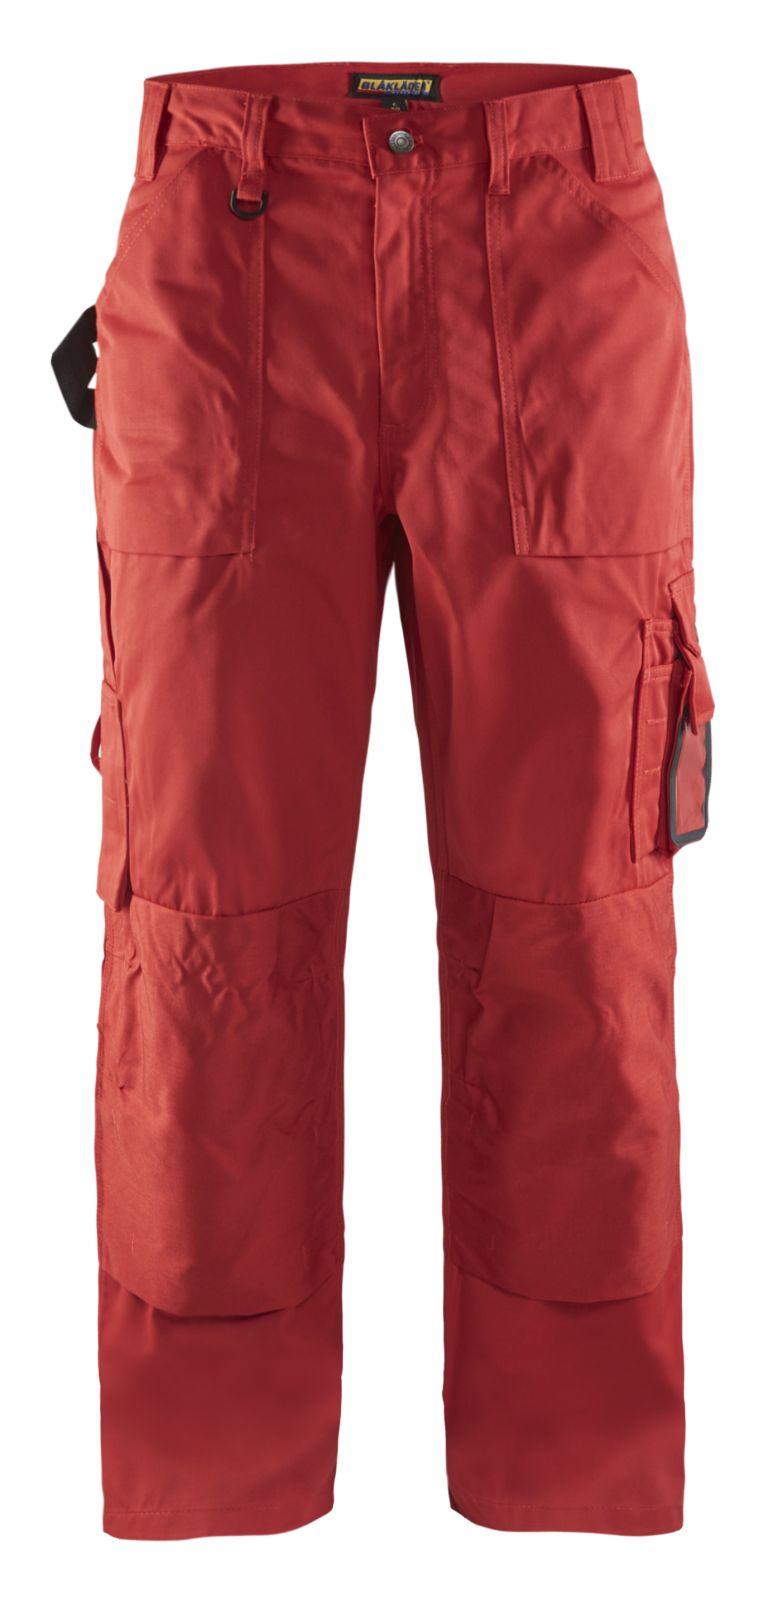 Blaklader Werkbroeken 15701860 rood(5600)